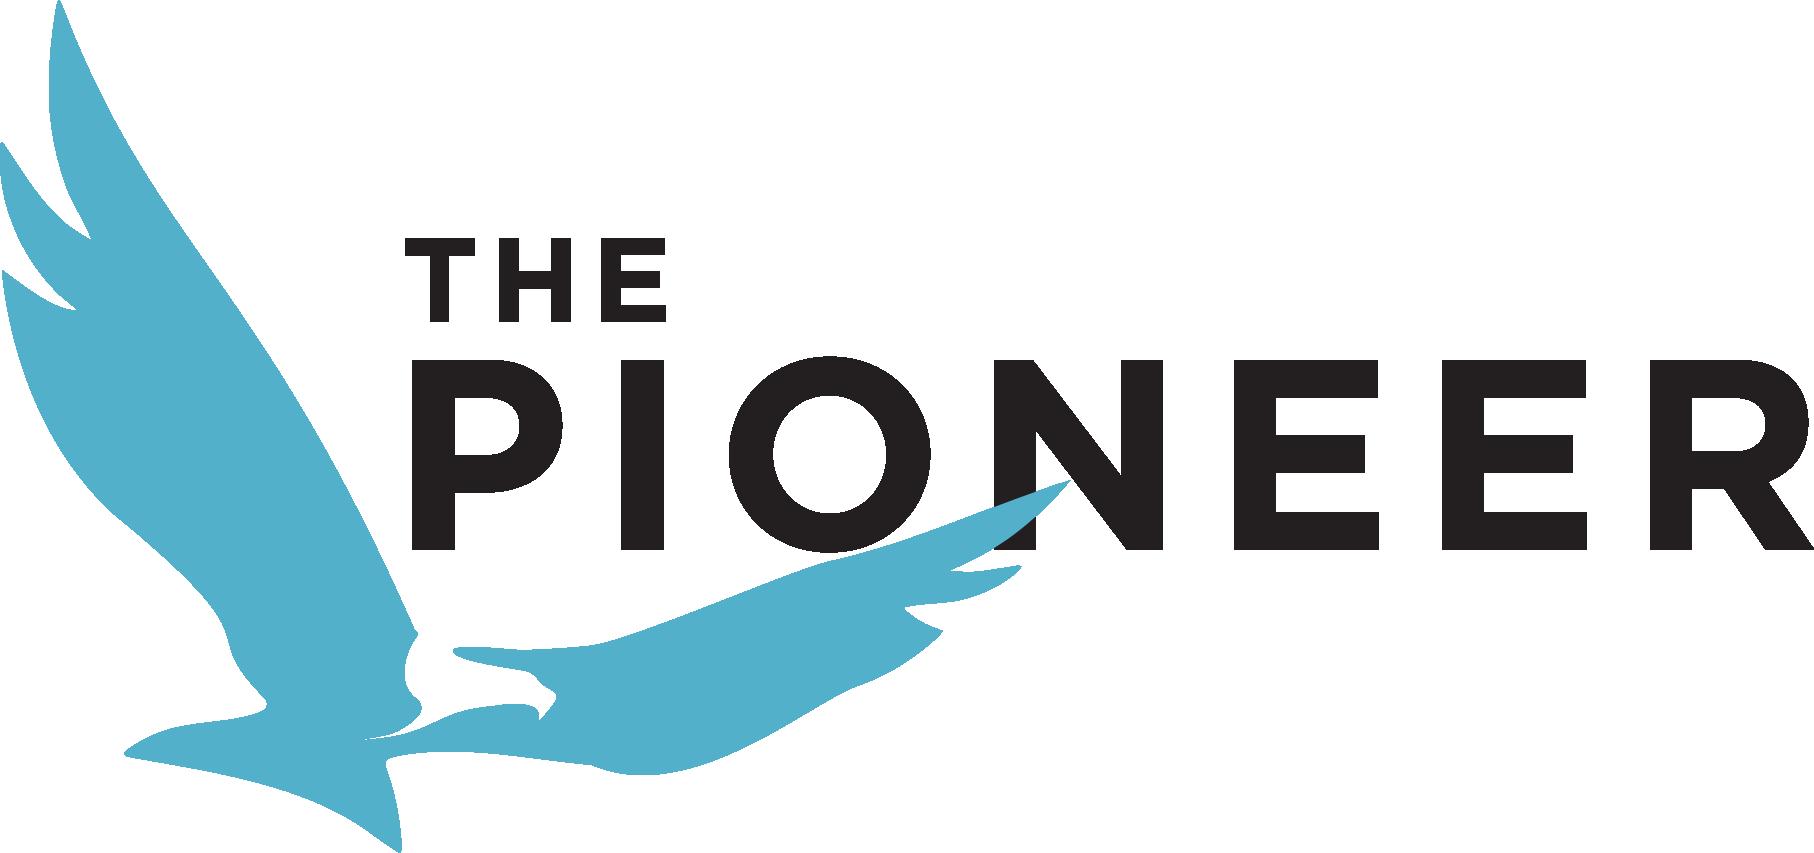 https://hackcville.com/pioneer/2017/11/01/babylonmicrofarms/